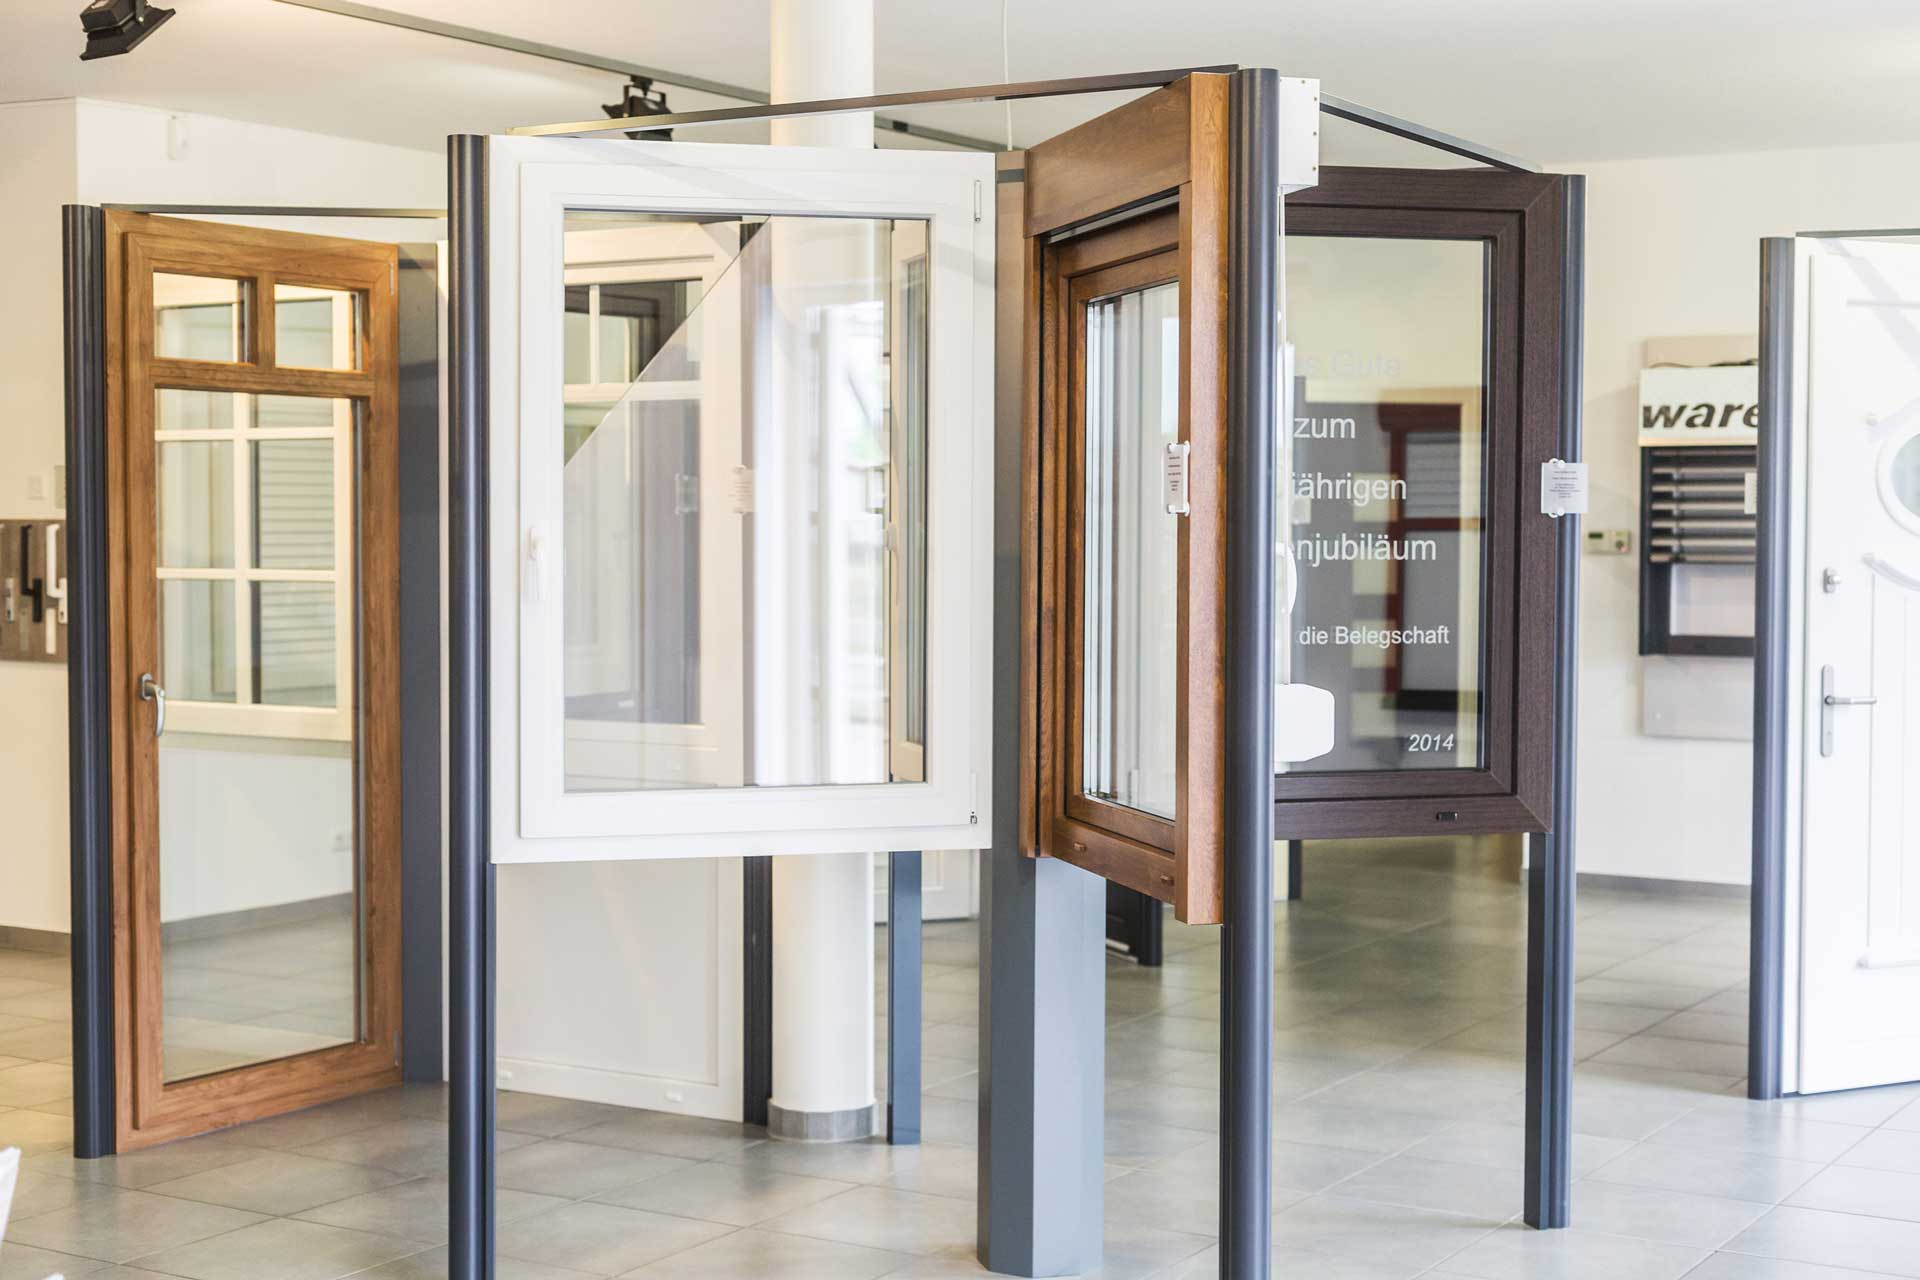 Fenster im Ausstellungsraum 1920x1280 | Koopmann&Hermes